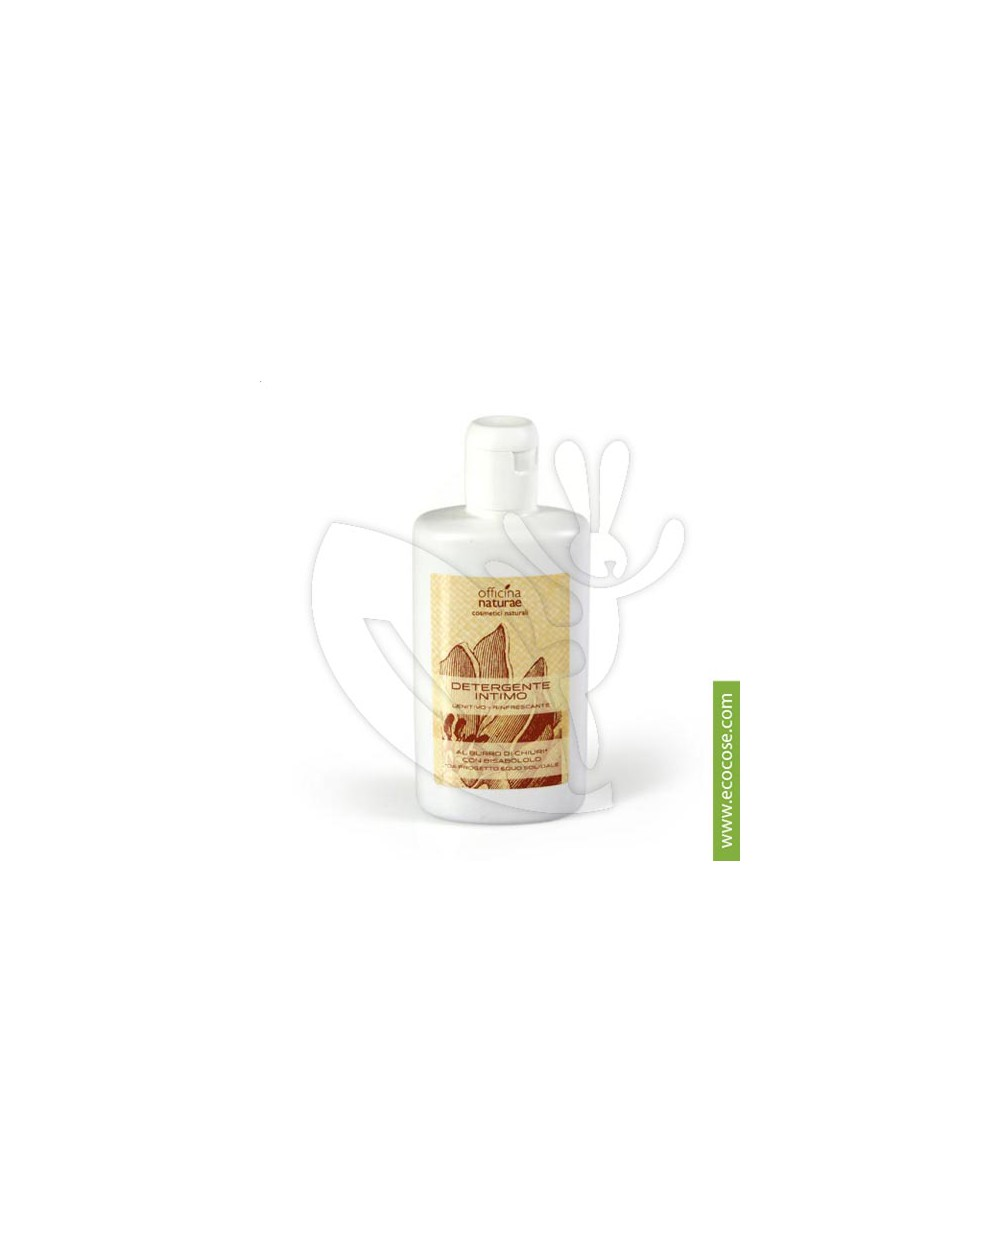 Officina Naturae - Detergente intimo al Burro di Chiuri